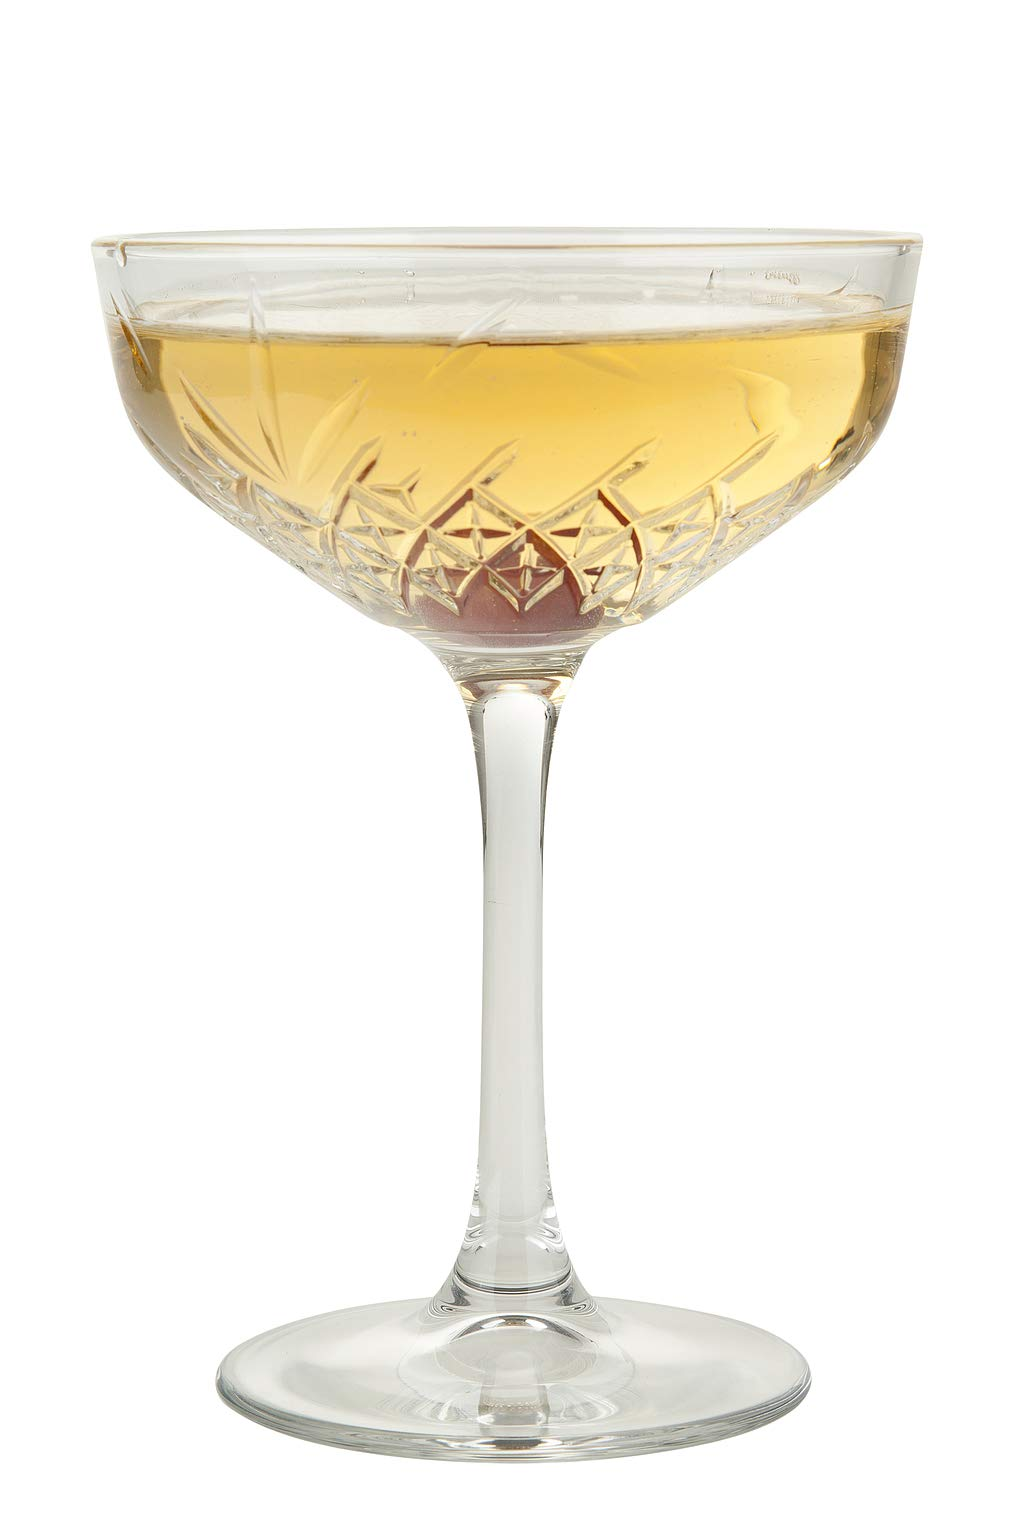 Pasabahce Premium Cocktail Coupe, Martini Glass 9 oz   Margarita   Decorative, Elegant, Rustic Vintage   Set of 4